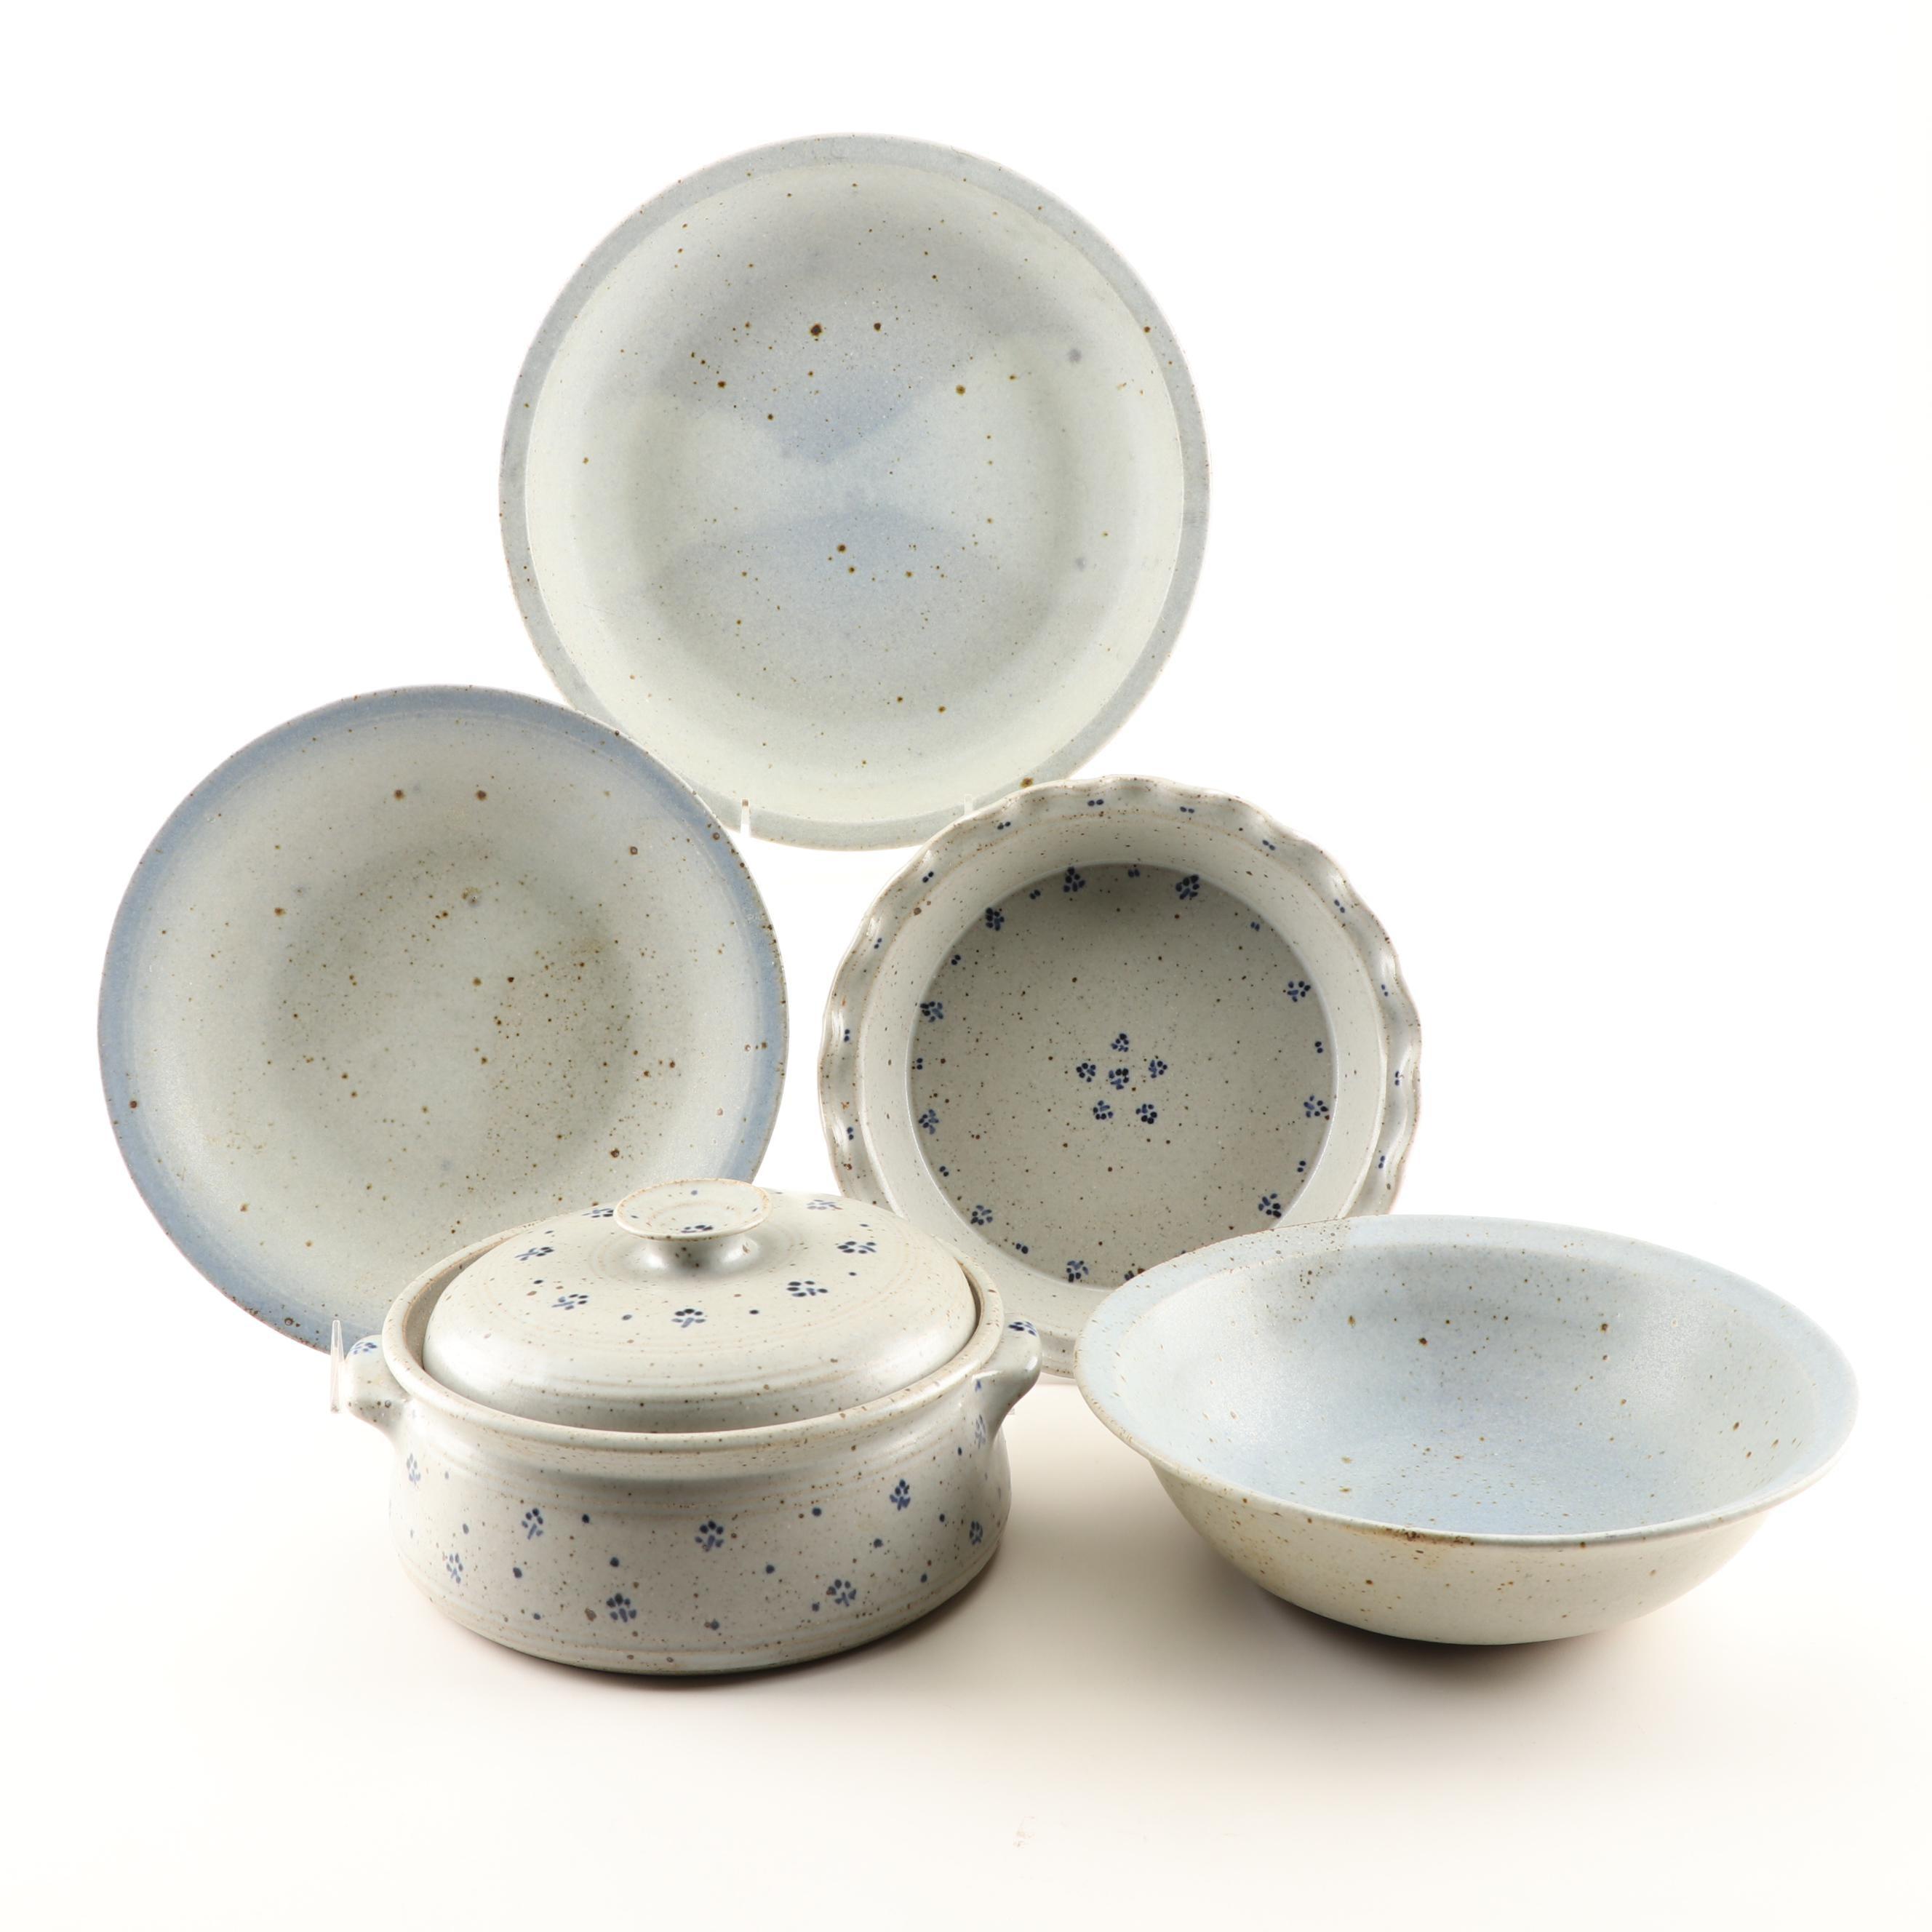 Wheel Thrown Stoneware Serveware